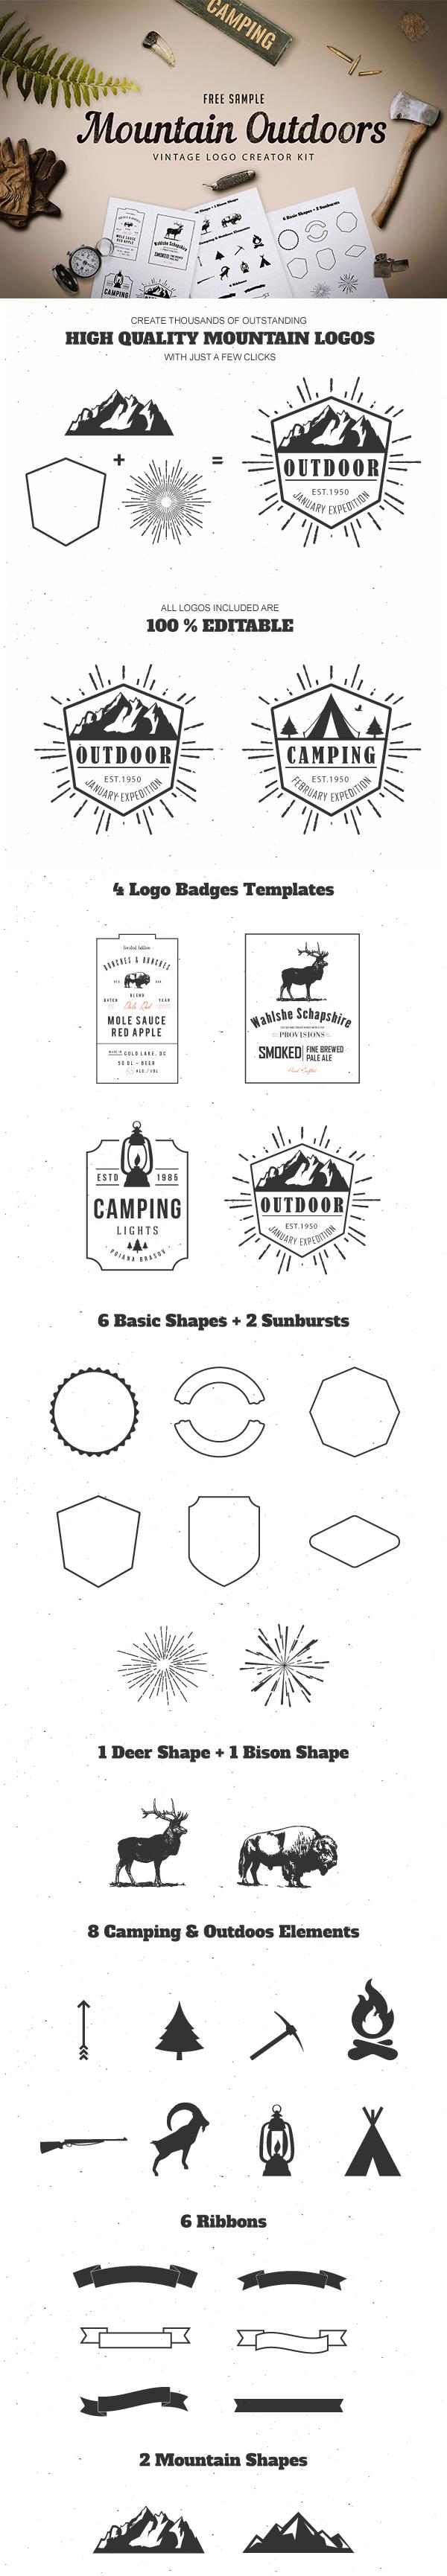 Mountain Outdoor Logo Design Kit for Graphic Design